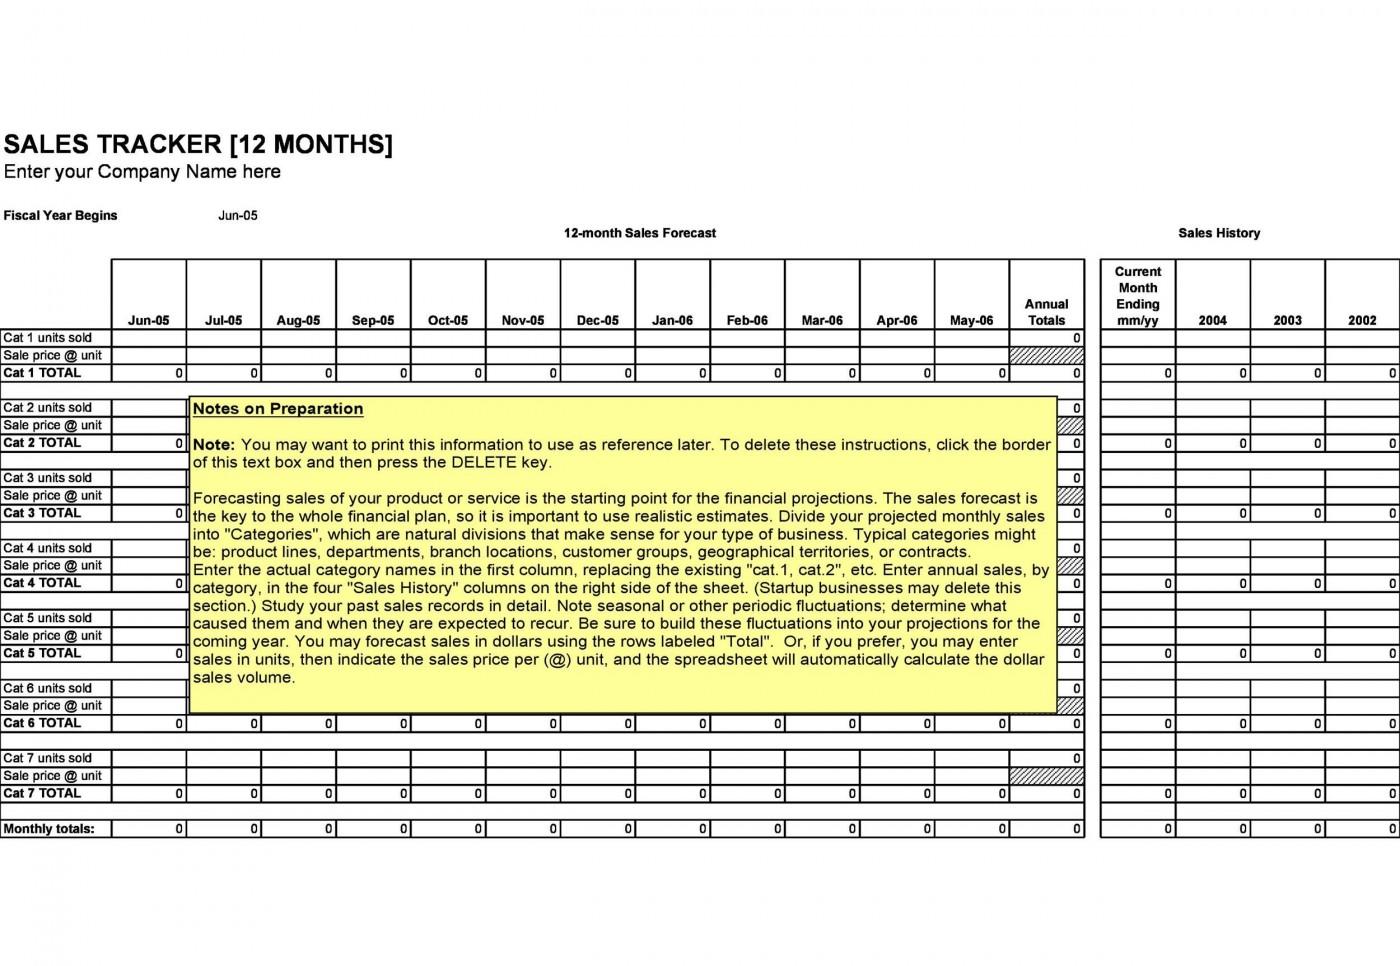 008 Stirring Sale Plan Template Word Sample  Compensation Free Busines1400